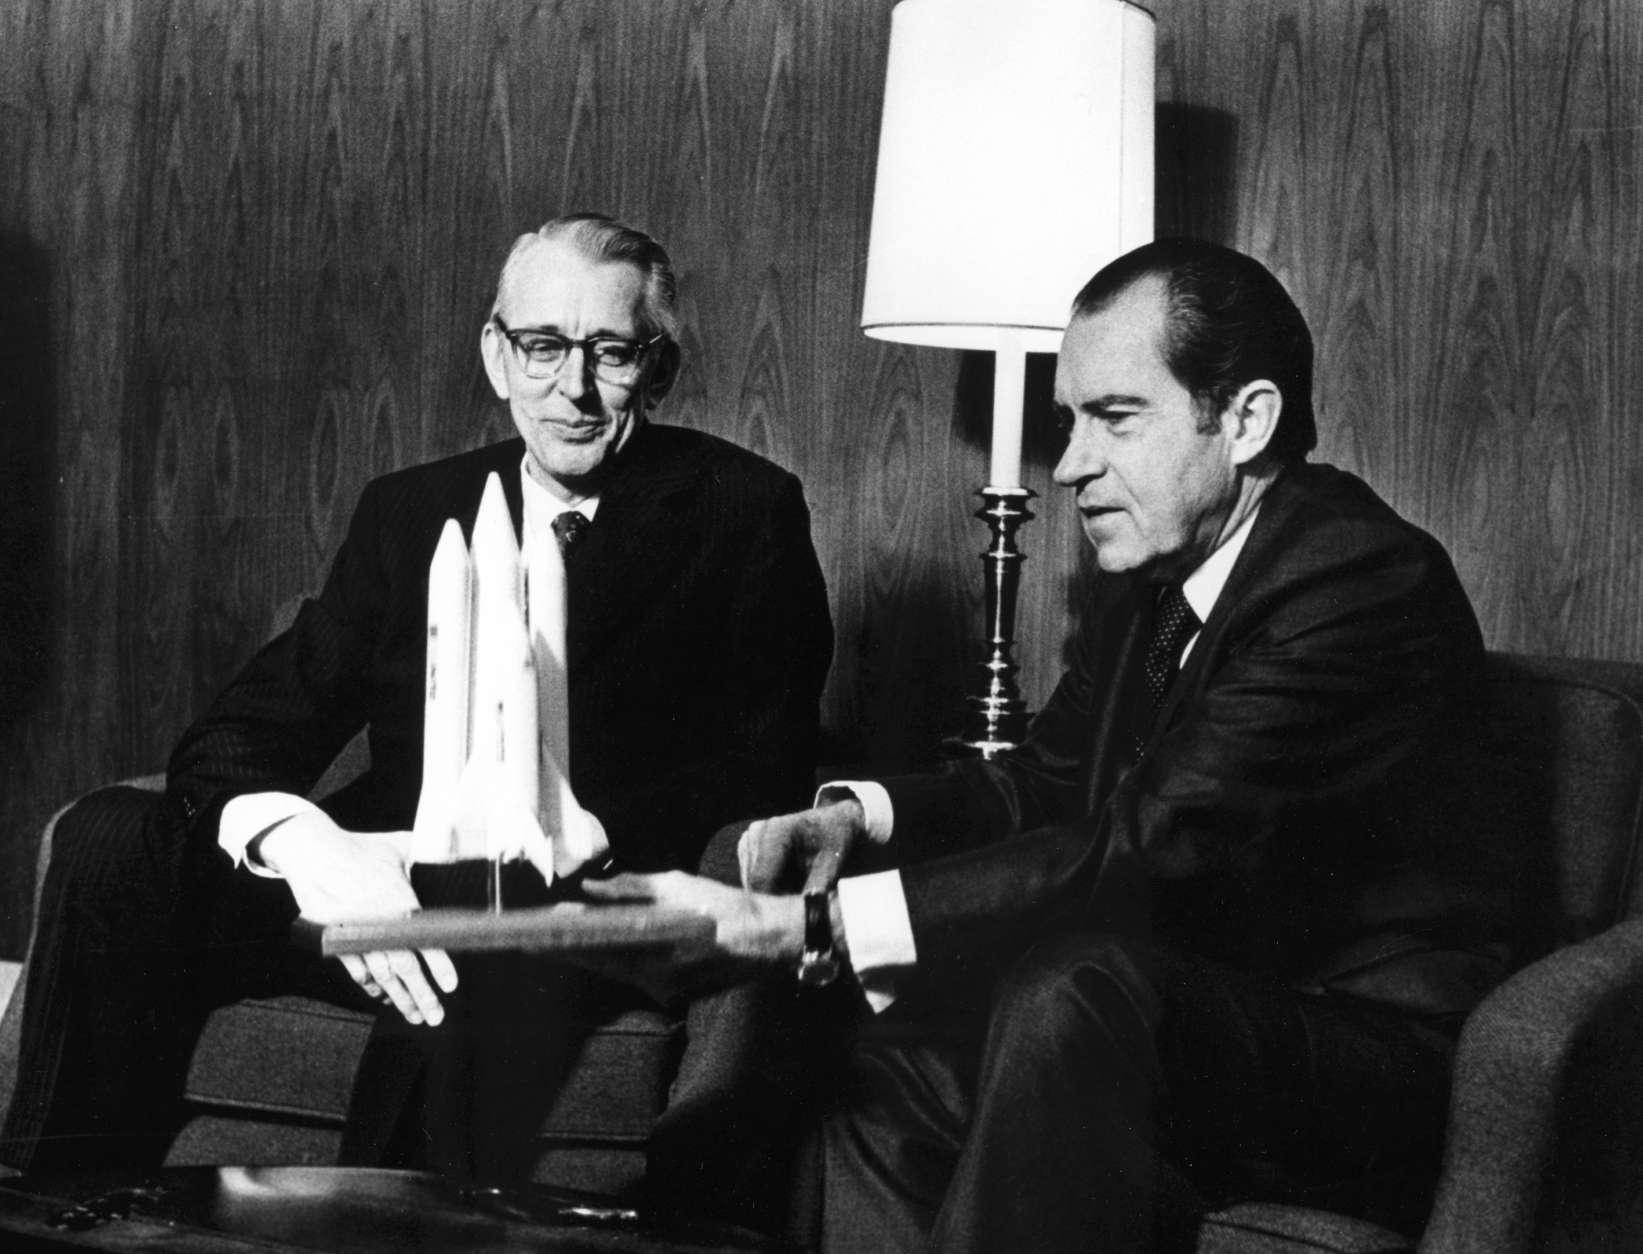 Nixon launches the shuttle program FederalNewsRadio